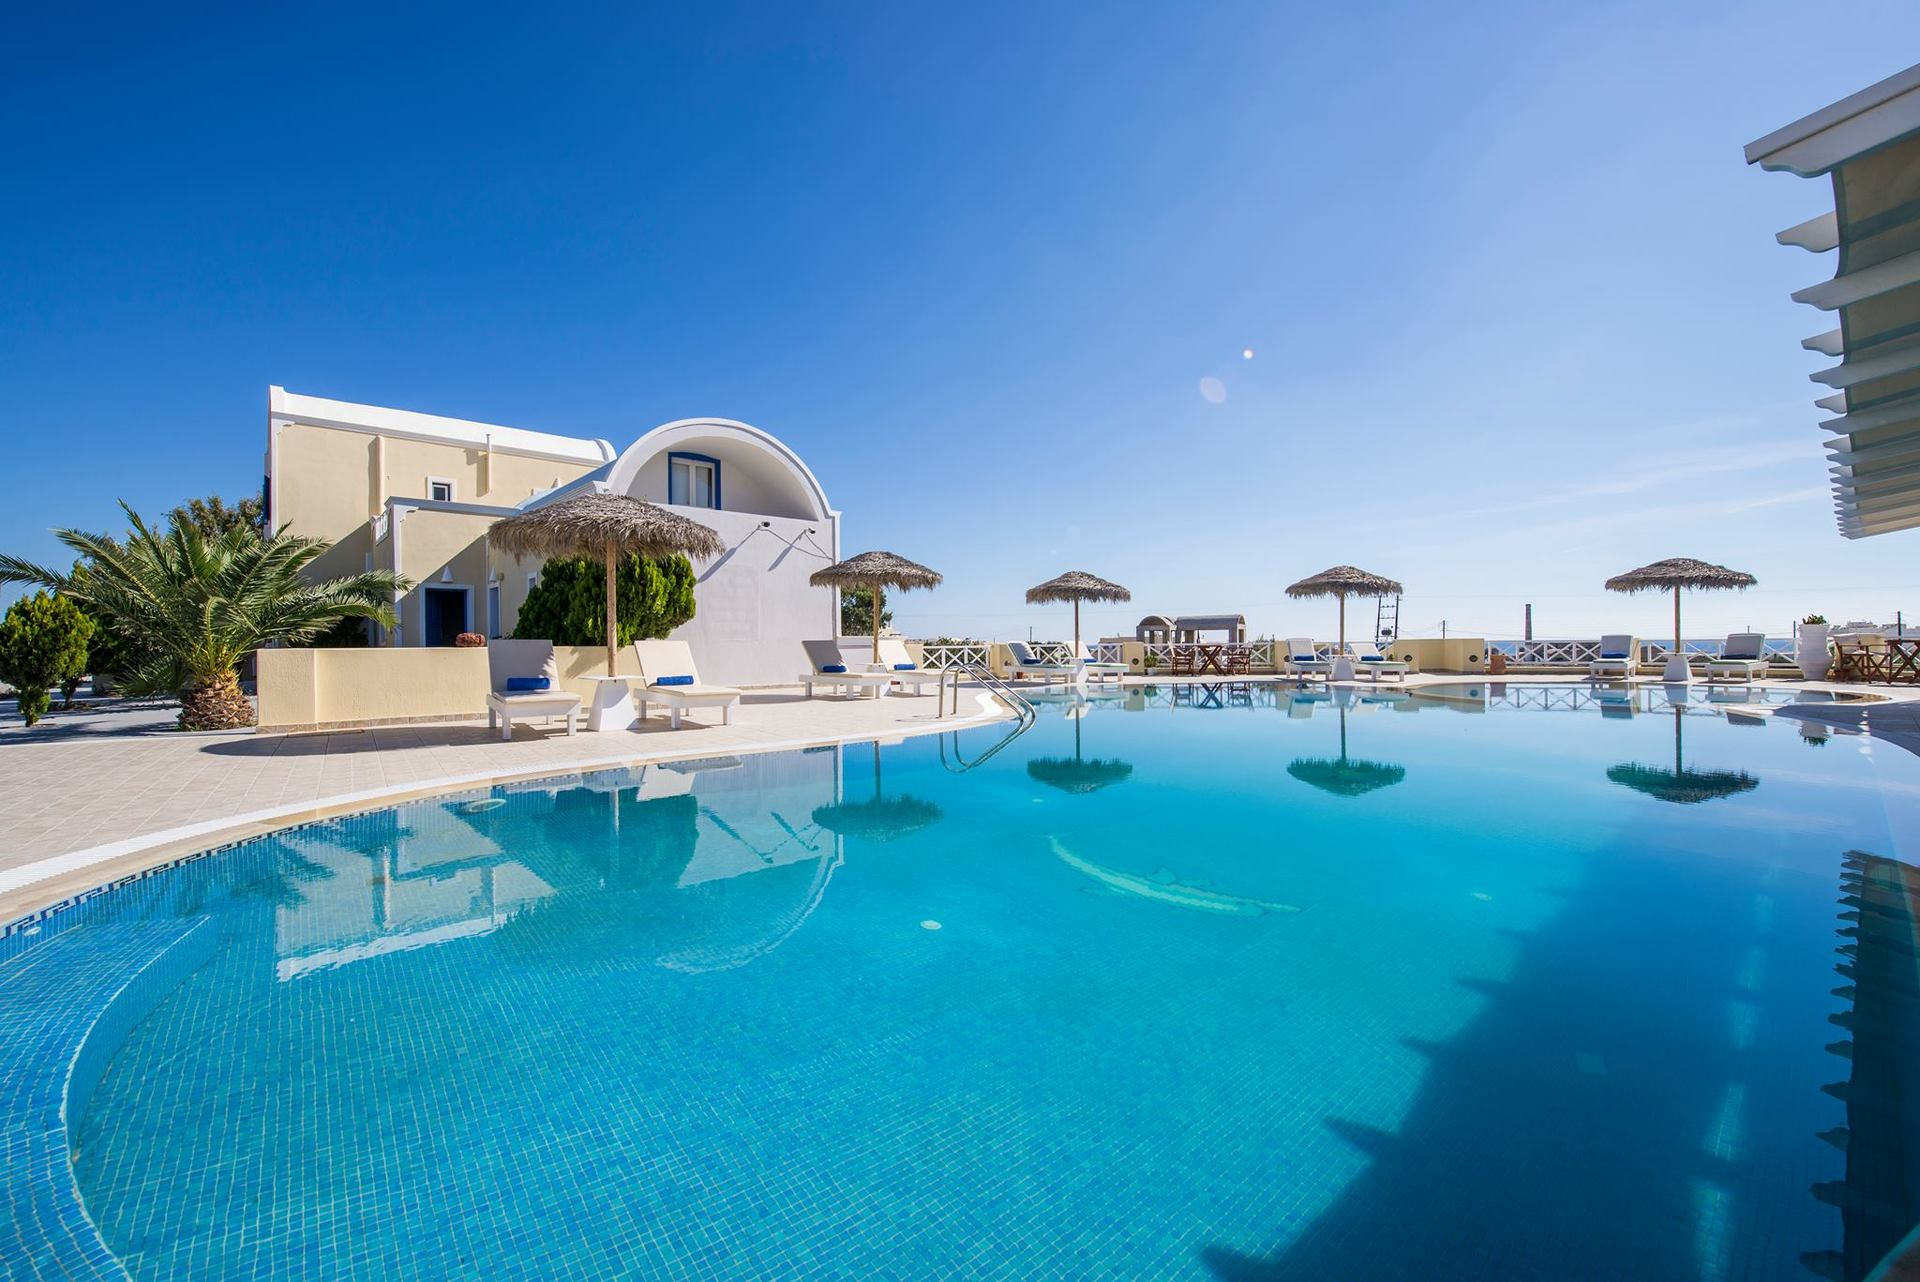 Hôtel Bella Santorini 4* Location Voiture Incluse